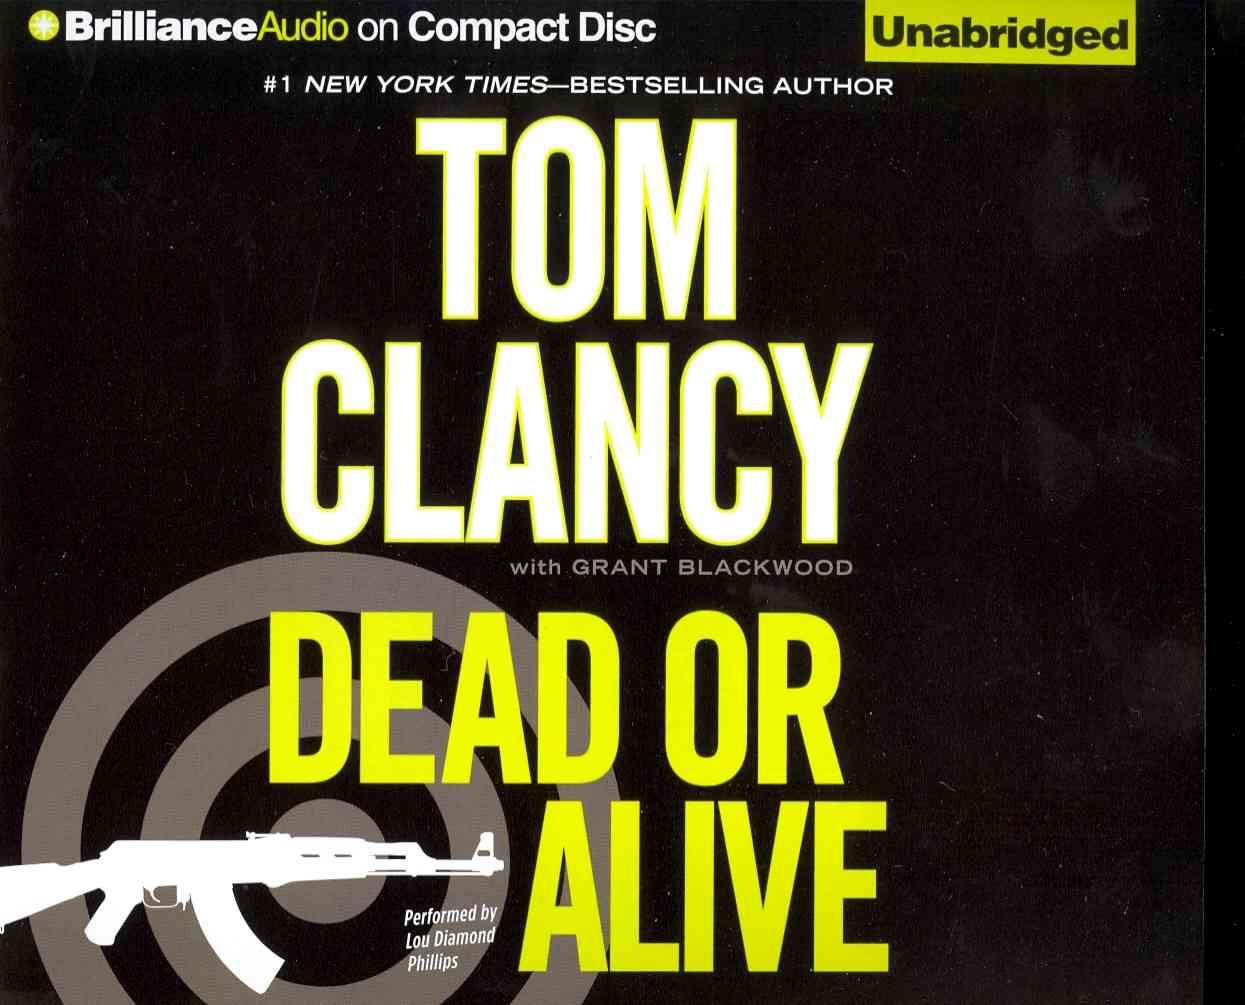 [CD] Dead or Alive By Clancy, Tom/ Phillips, Lou Diamond (NRT)